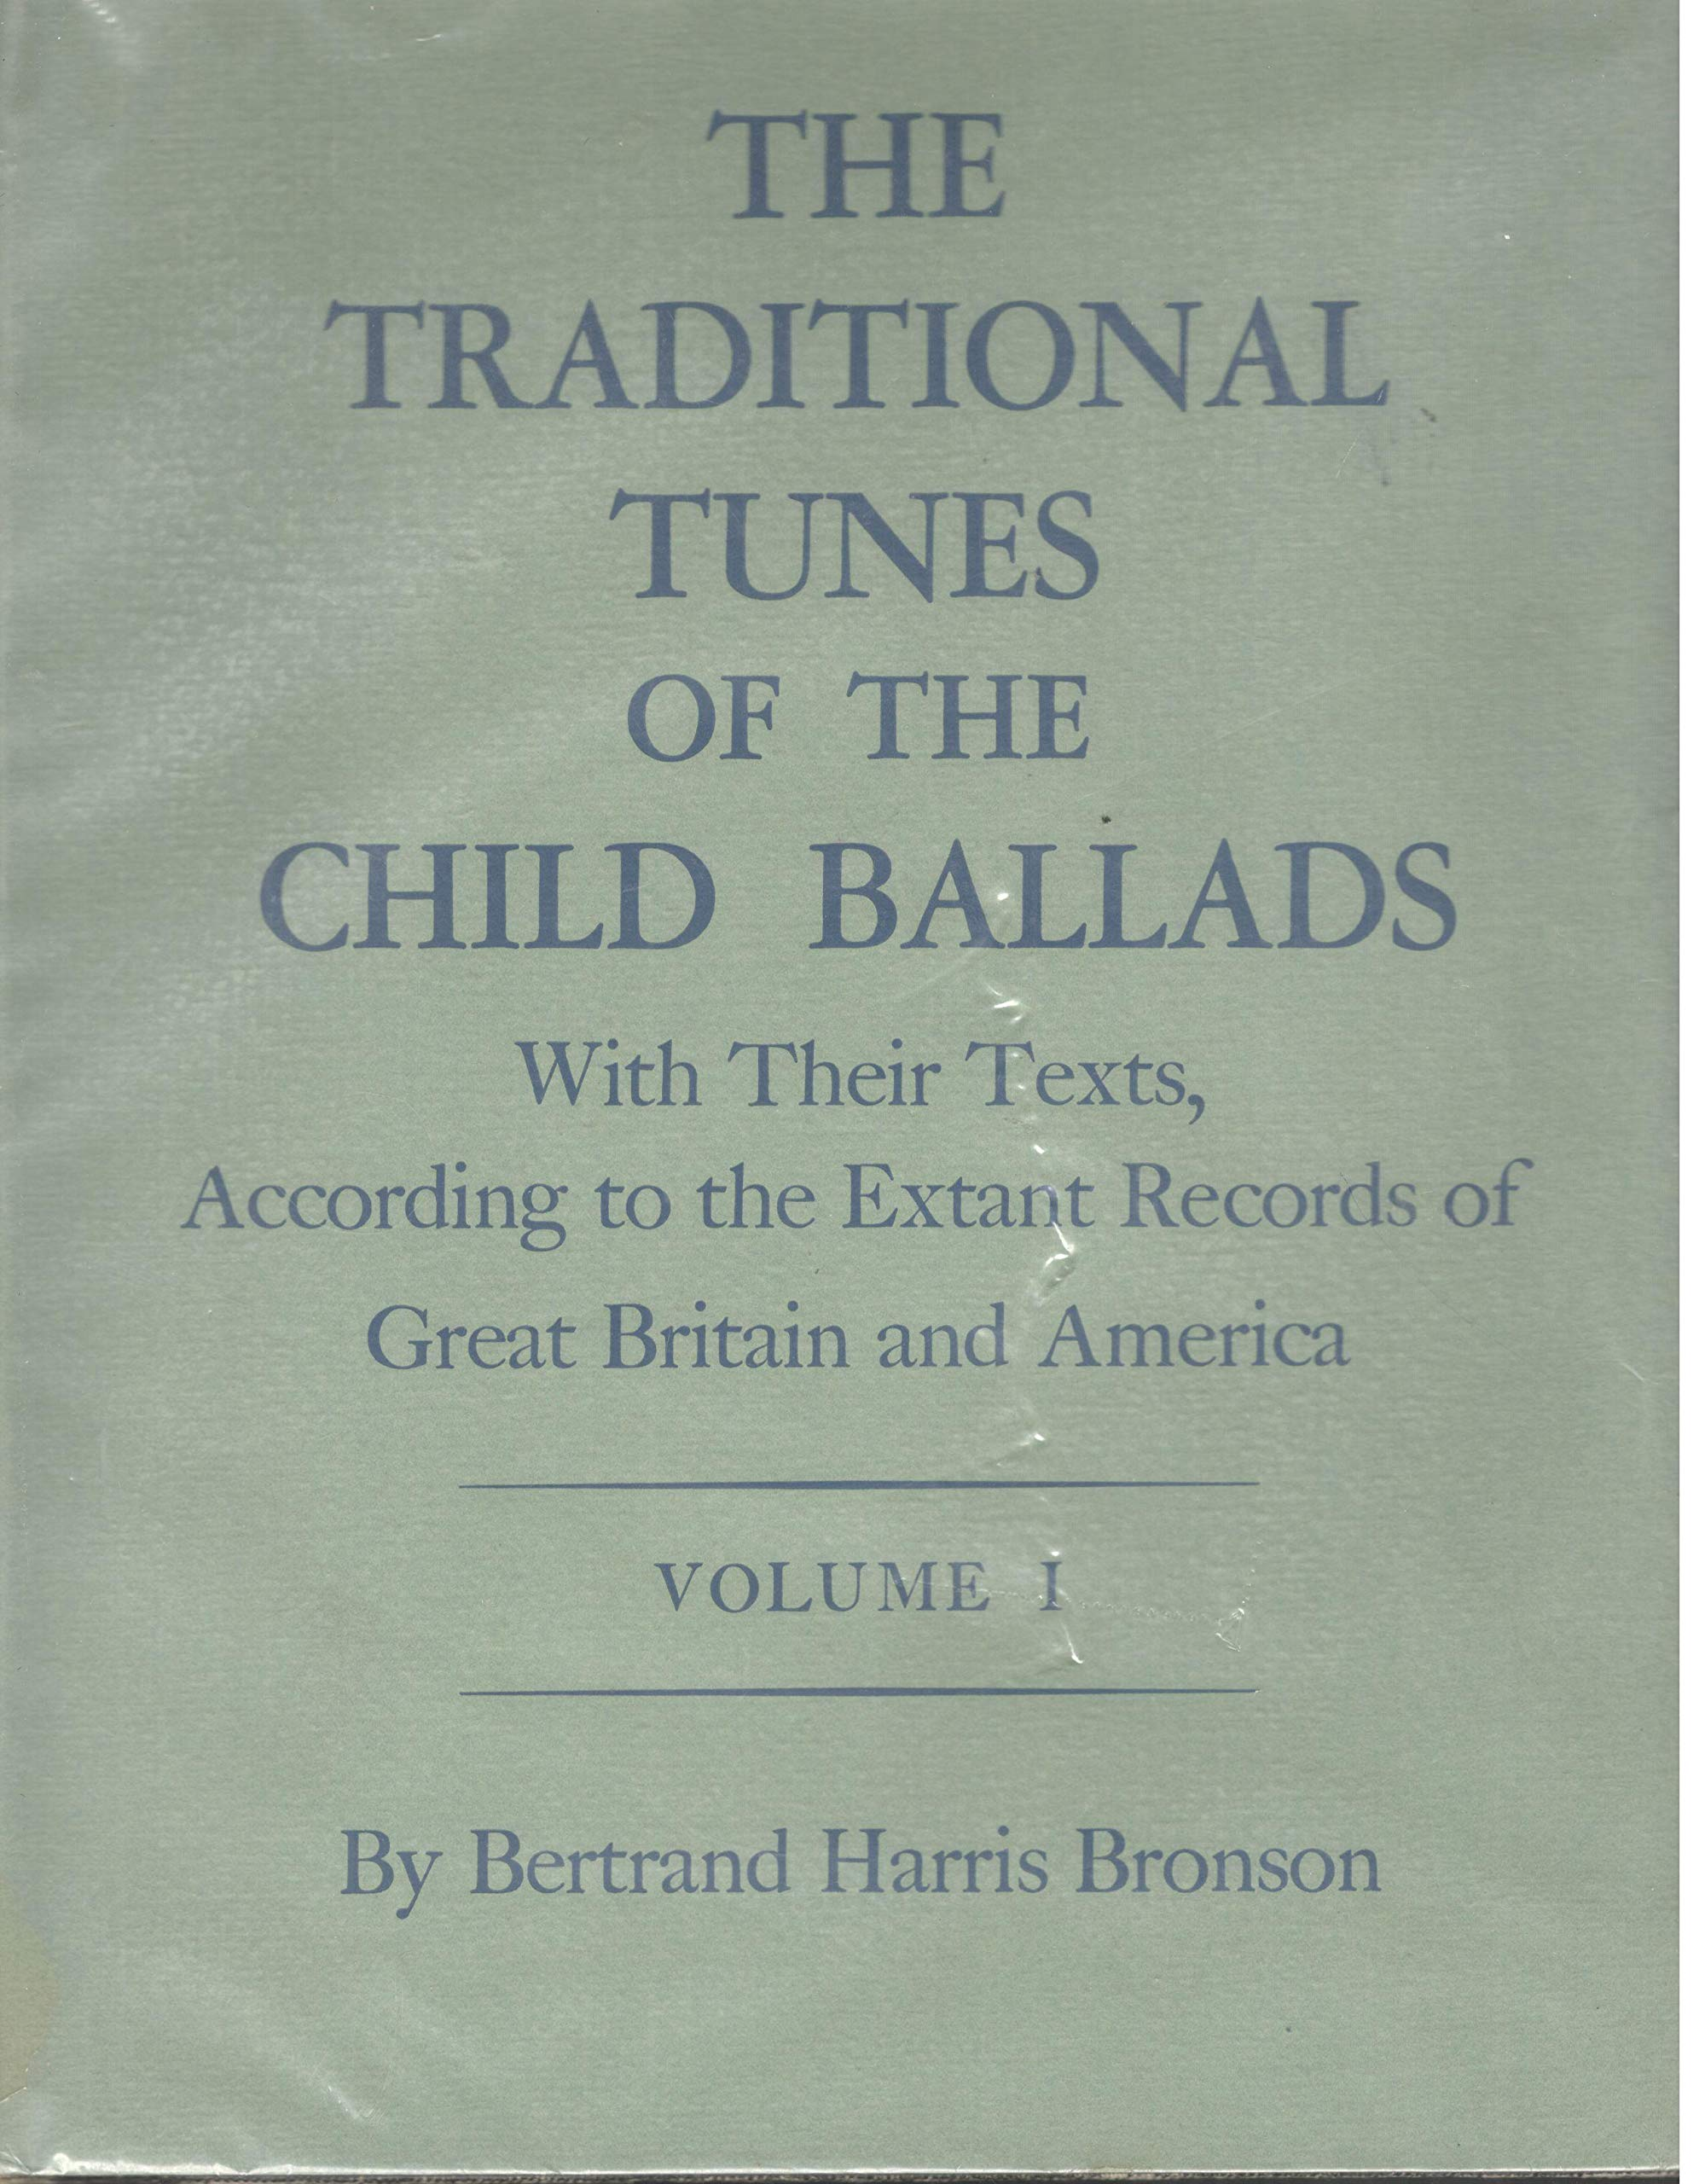 The Traditional Tunes of the Child Ballads, Volume 1 (Princeton Legacy Library, 2404): Bronson, Bertrand Harris: 9780691091044: Amazon.com: Books